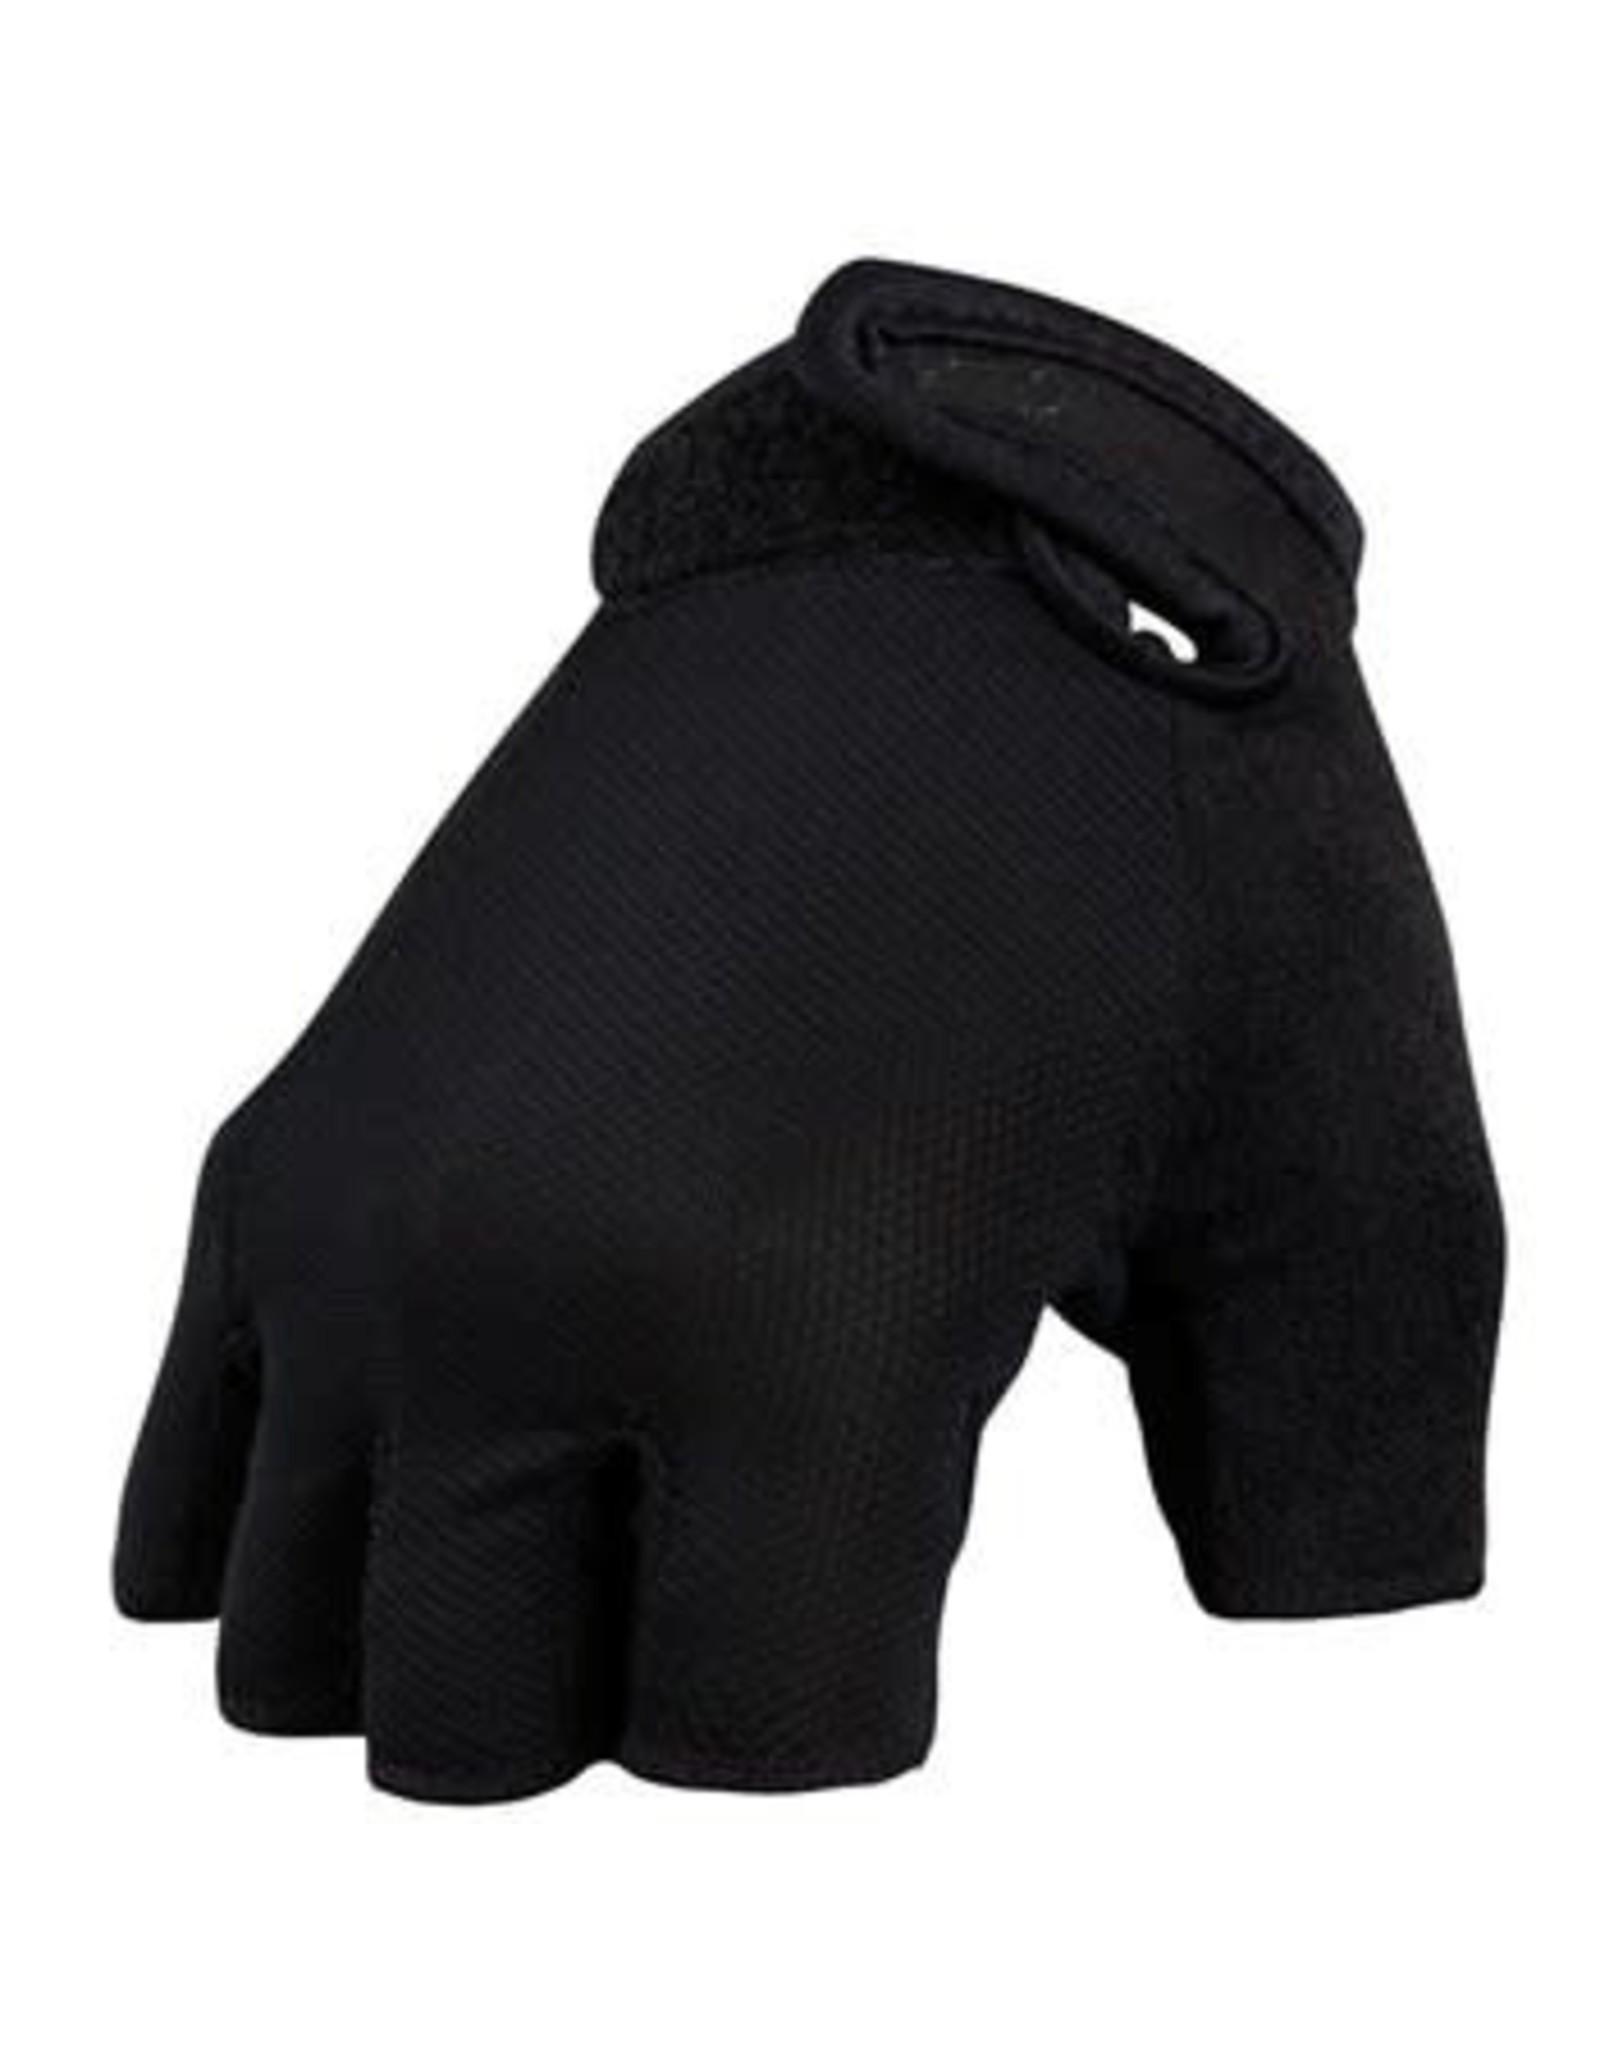 Sugoi Performance Glove Short